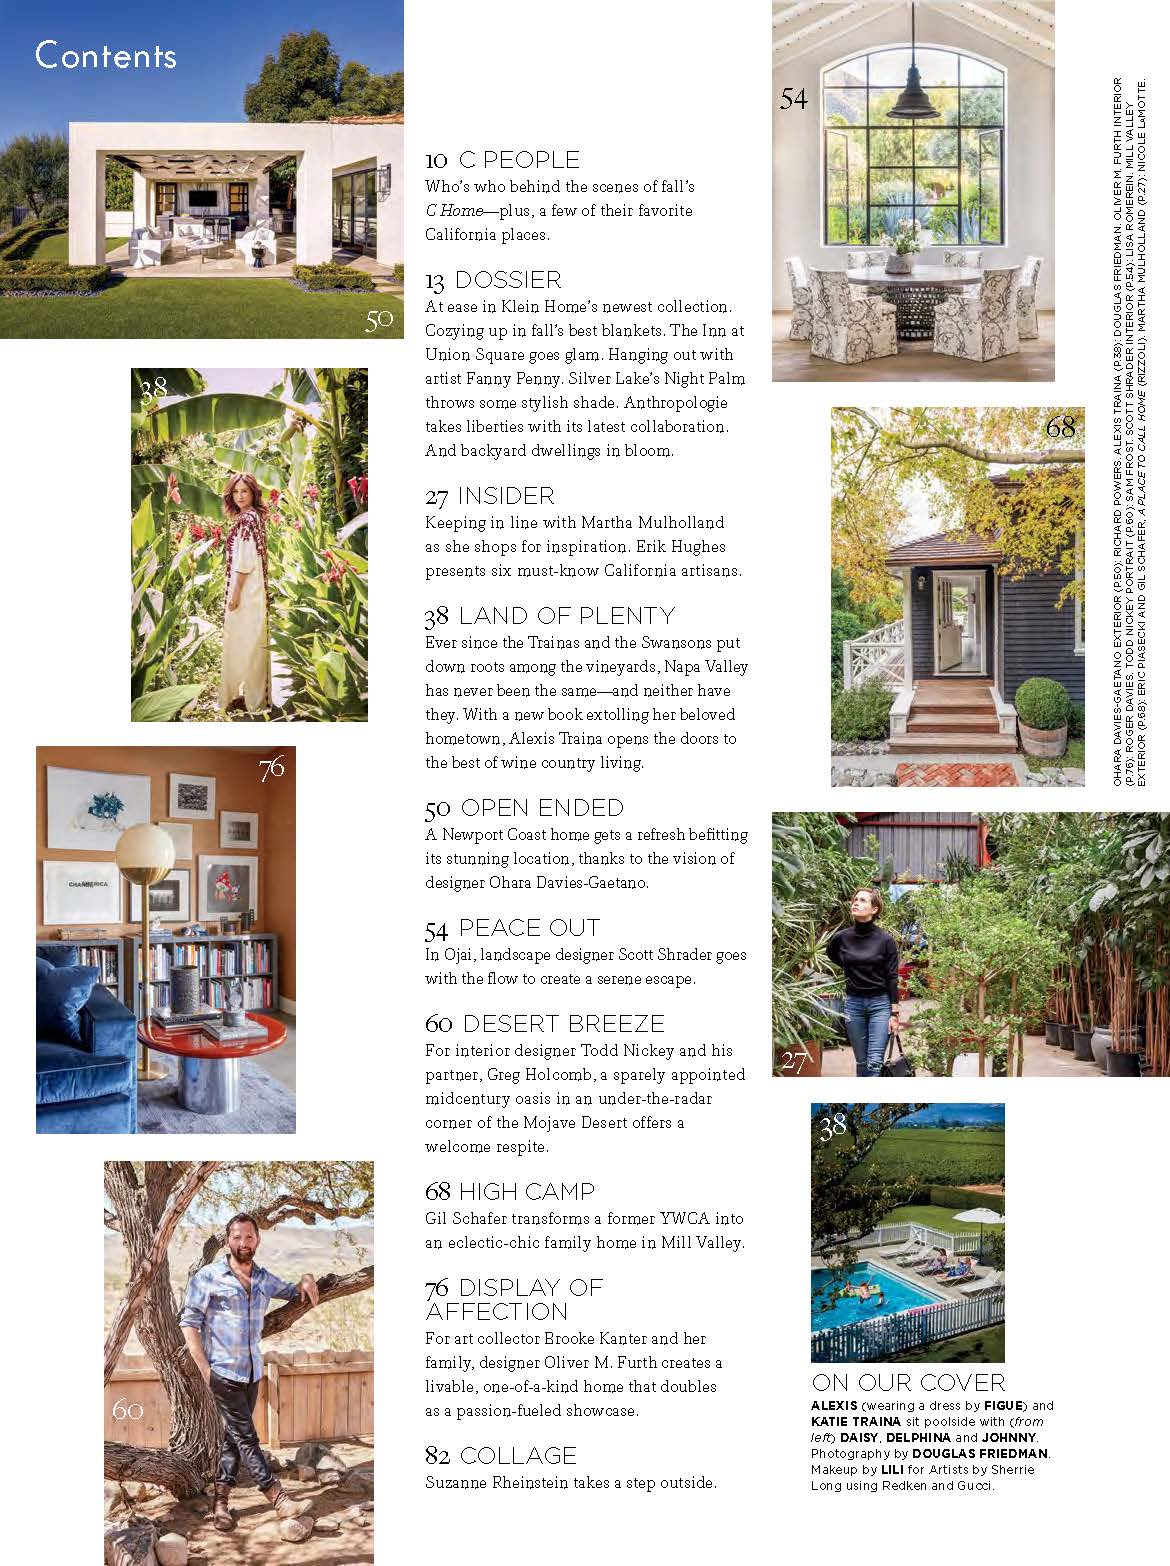 C Home Fall 2017, Land of Plenty (Alexis Traina)_Page_2.jpg